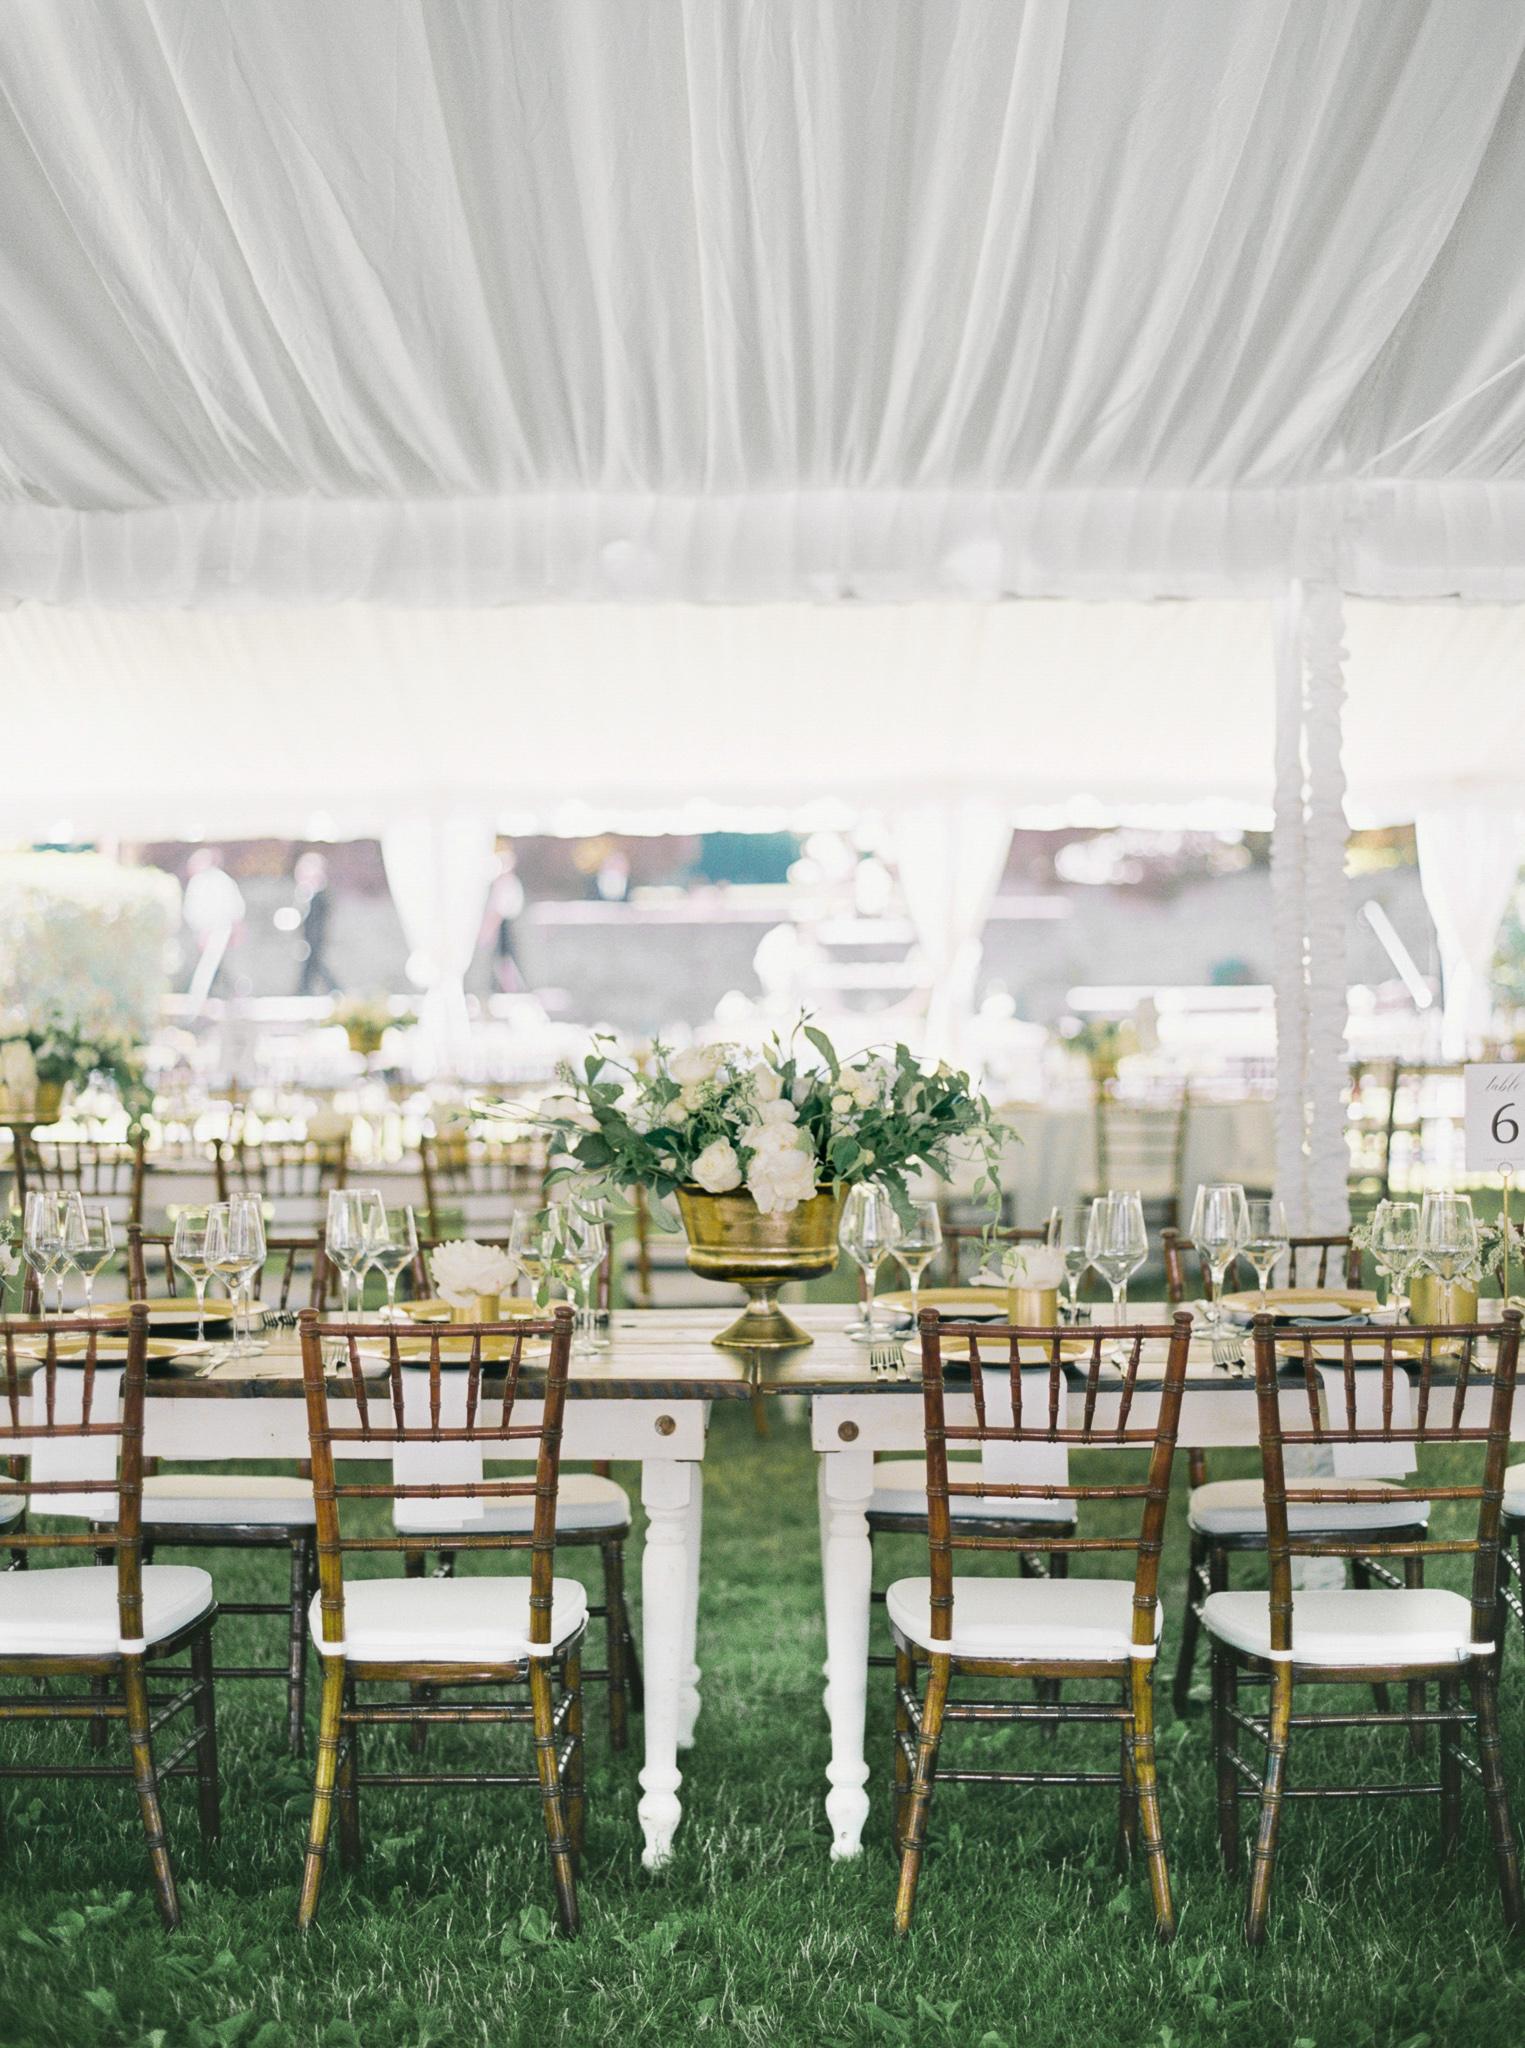 177OutliveCreative_Travel_Photographer_Videographer_Lewis&Clark_Oregon_Elegant_BlackTie_Destination_Wedding.jpg